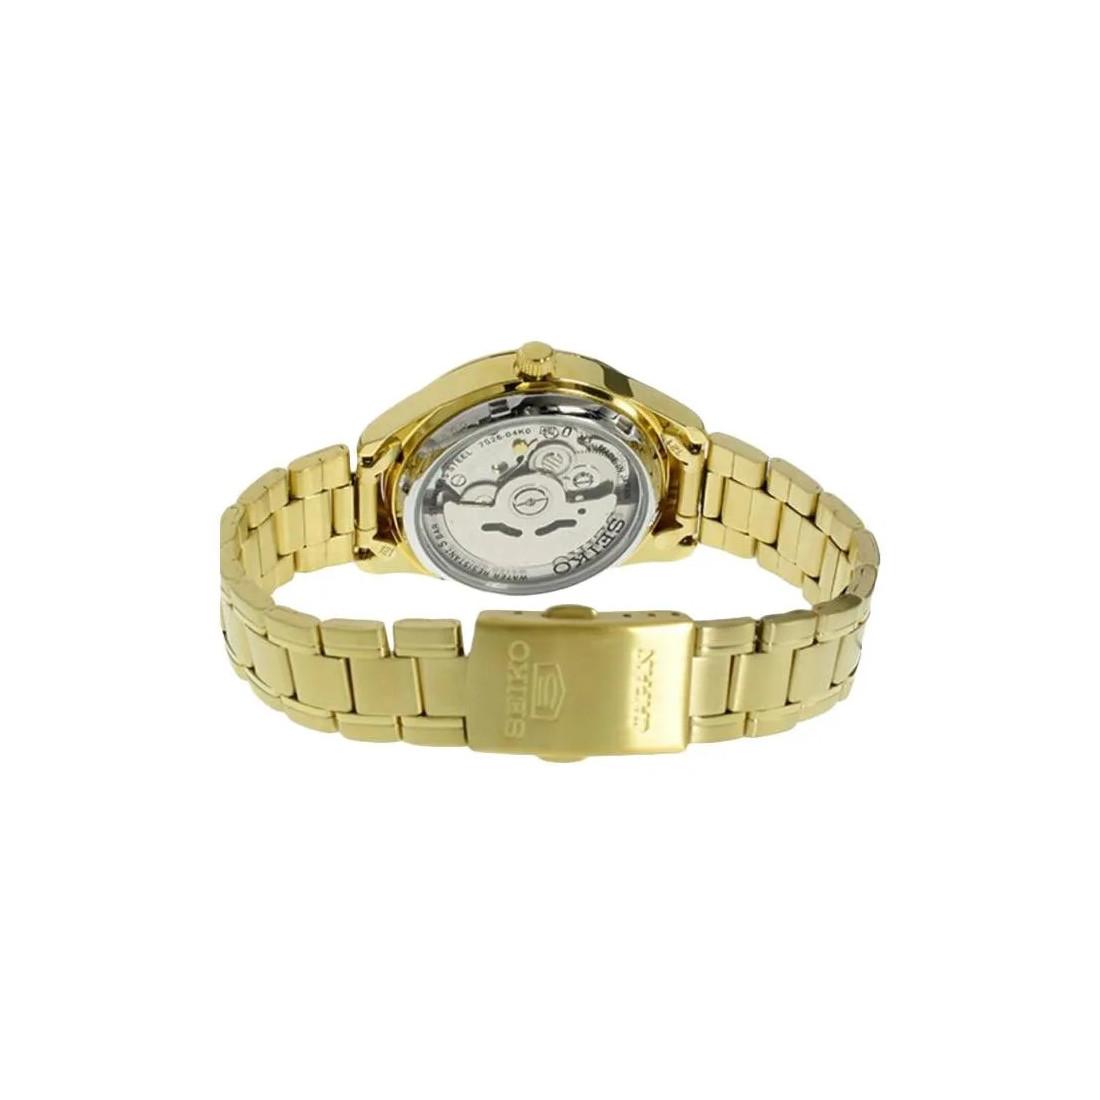 fossil indonesia fossil jam tangan fossil koleksi fossil